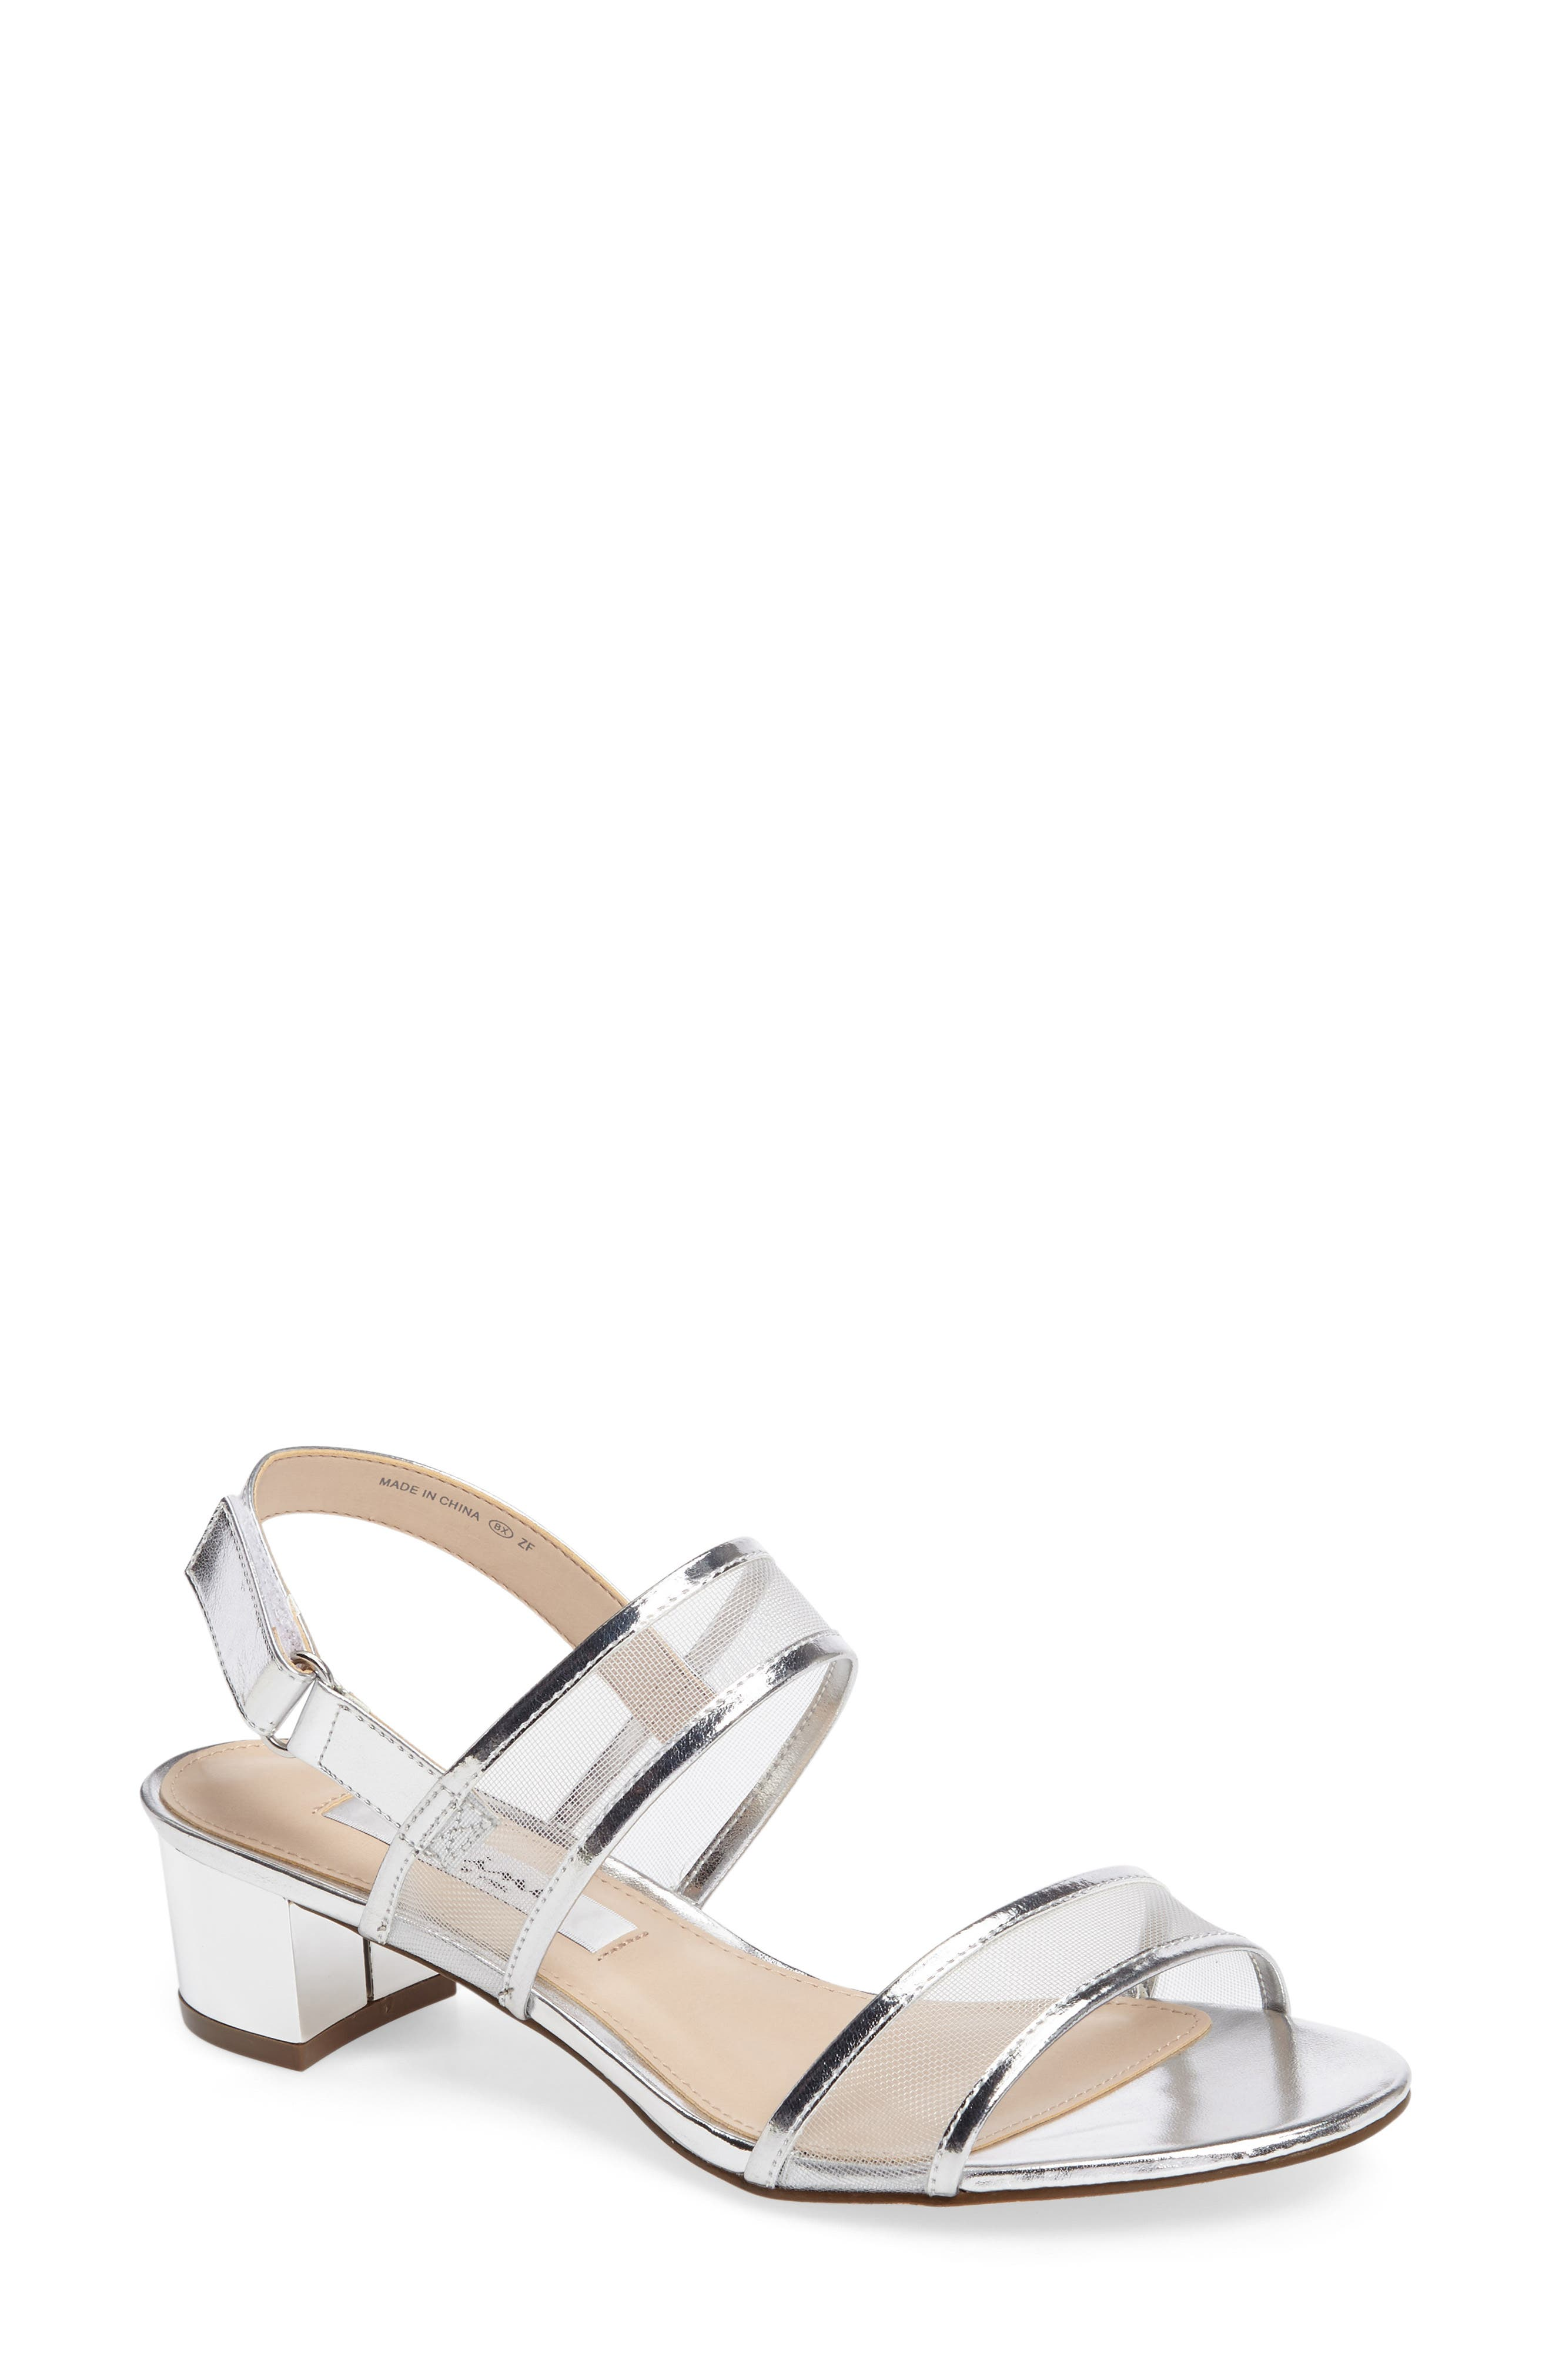 Ganice Mesh Strap Sandal,                             Main thumbnail 1, color,                             Silver Faux Leather